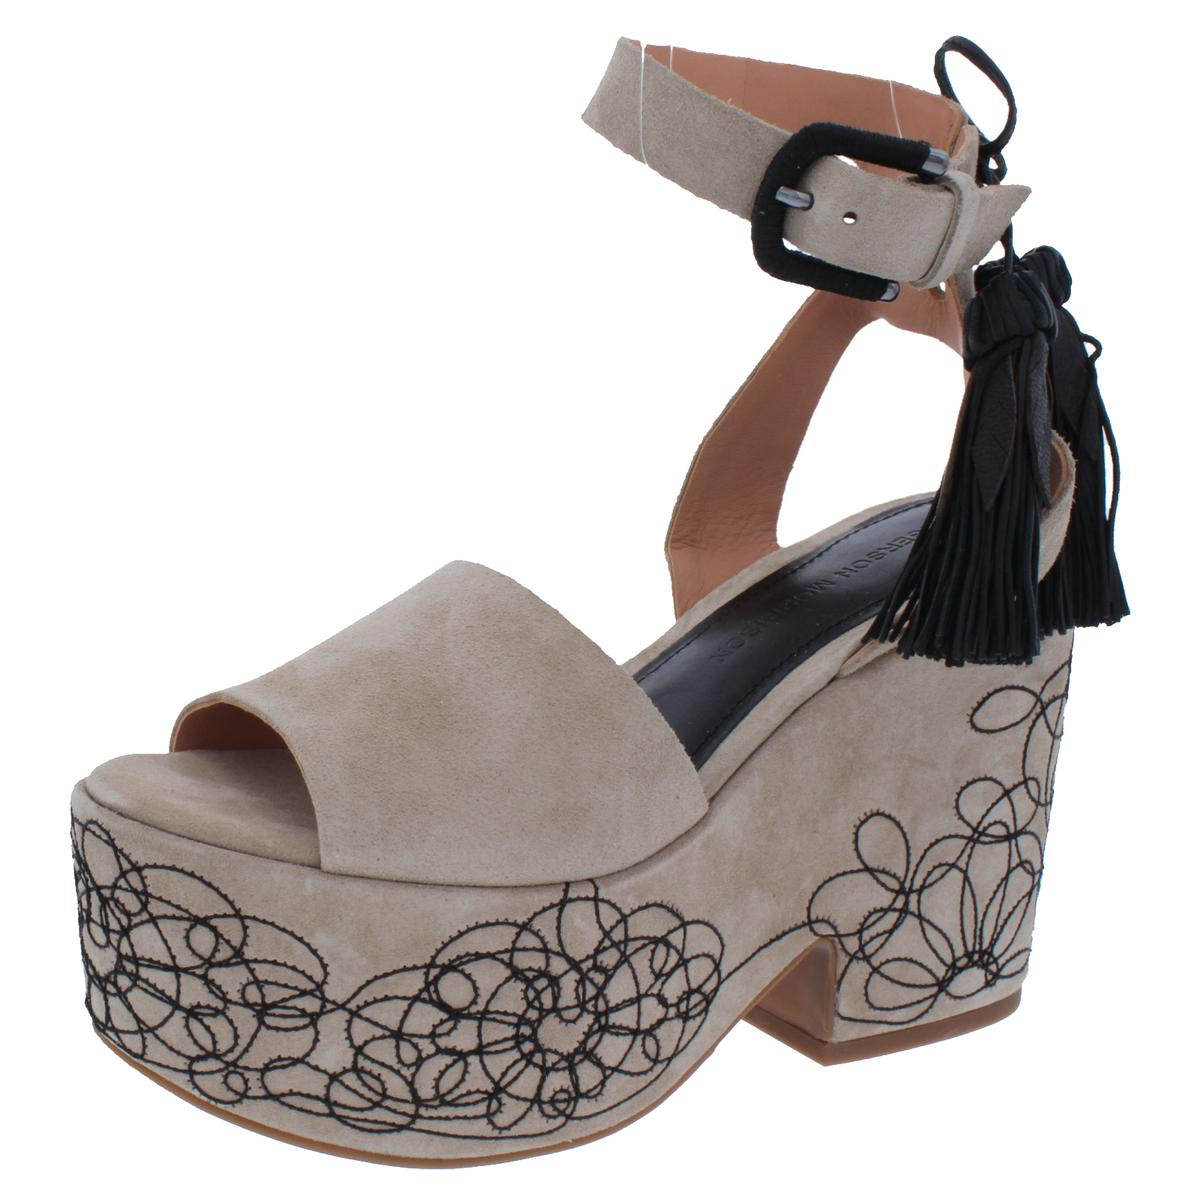 3f2a7aa9c130 Details about Sigerson Morrison Womens Beia Taupe Platform Sandals 6 Medium  (B